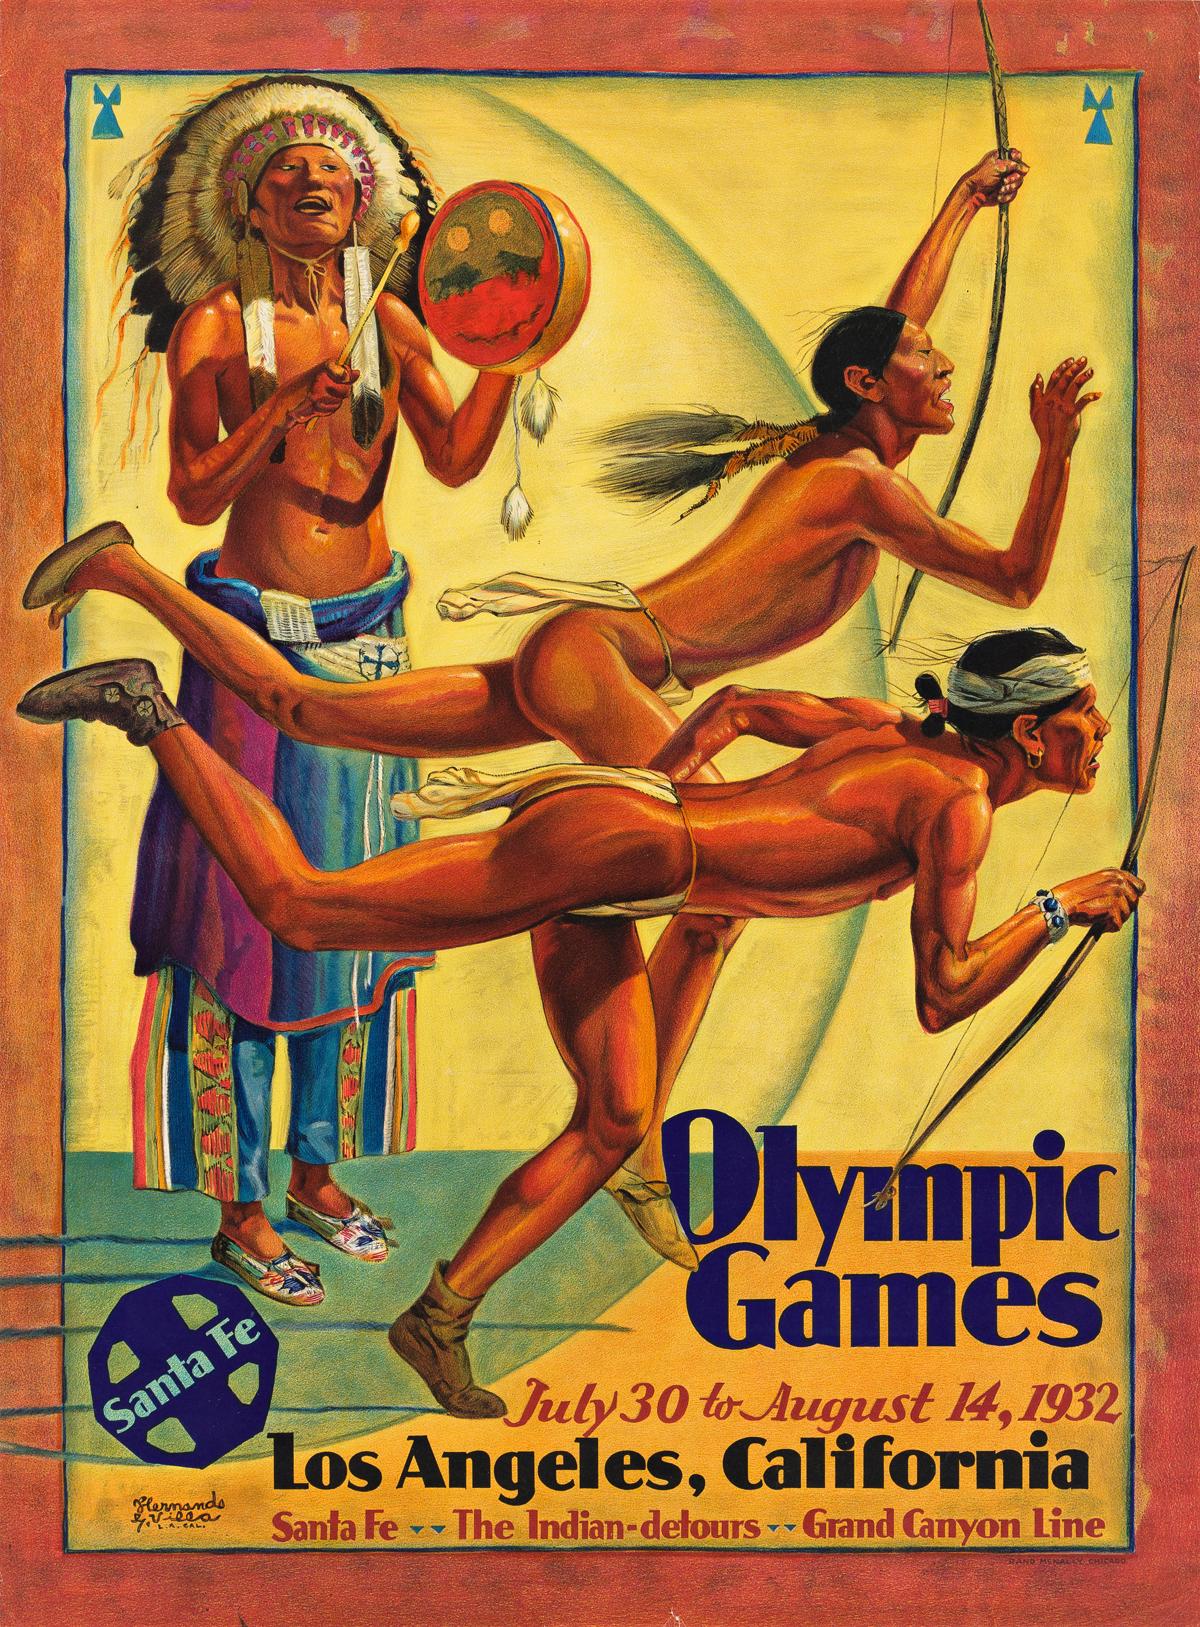 HERNANDO GONZALLO VILLA (1881-1952).  OLYMPIC GAMES / LOS ANGELES, CALIFORNIA / SANTA FE. 1932. 26½x19½ inches, 67¼x49¼ cm. Rand McNall